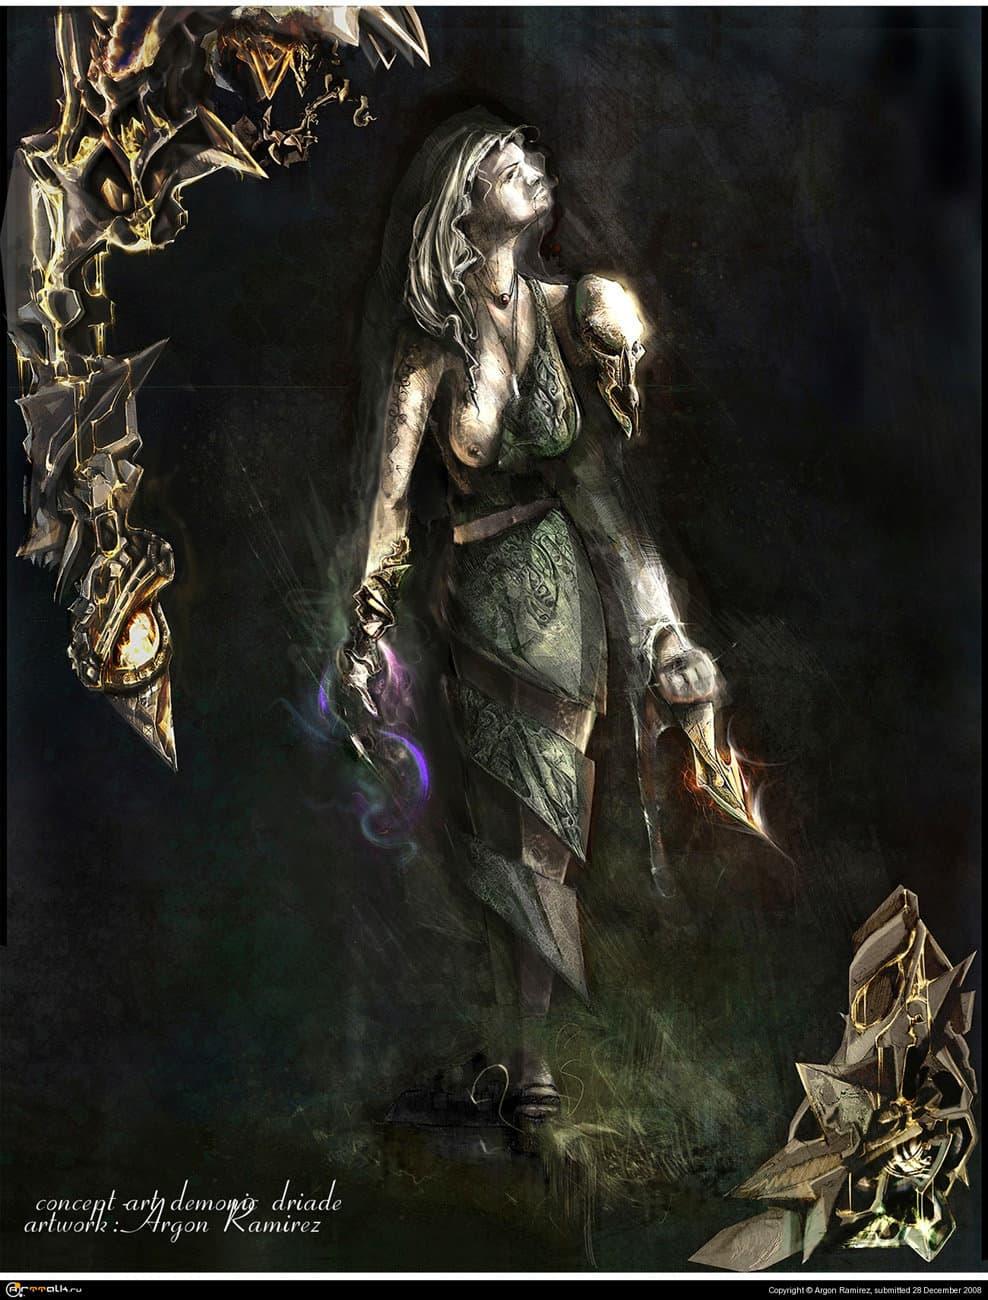 Demonic Driade